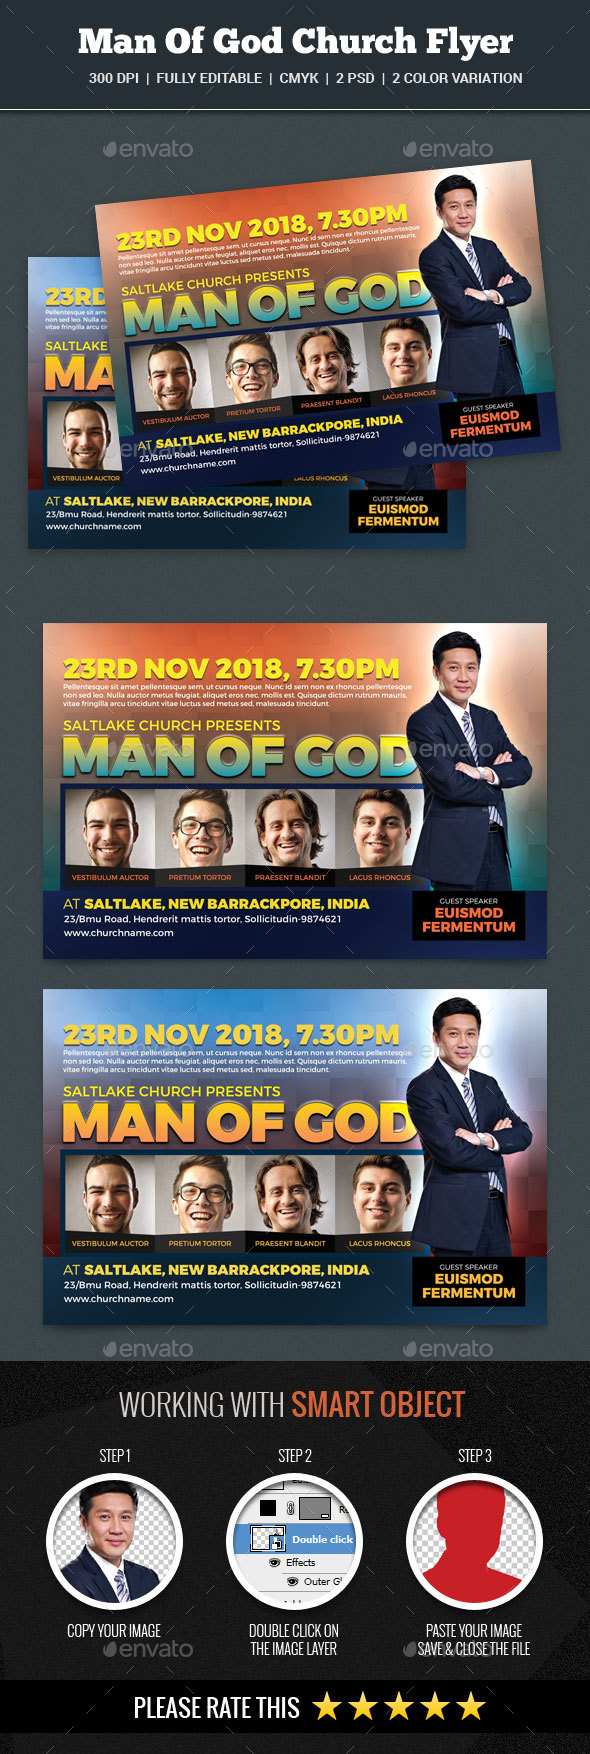 Man Of God Church Flyer - Church Flyers